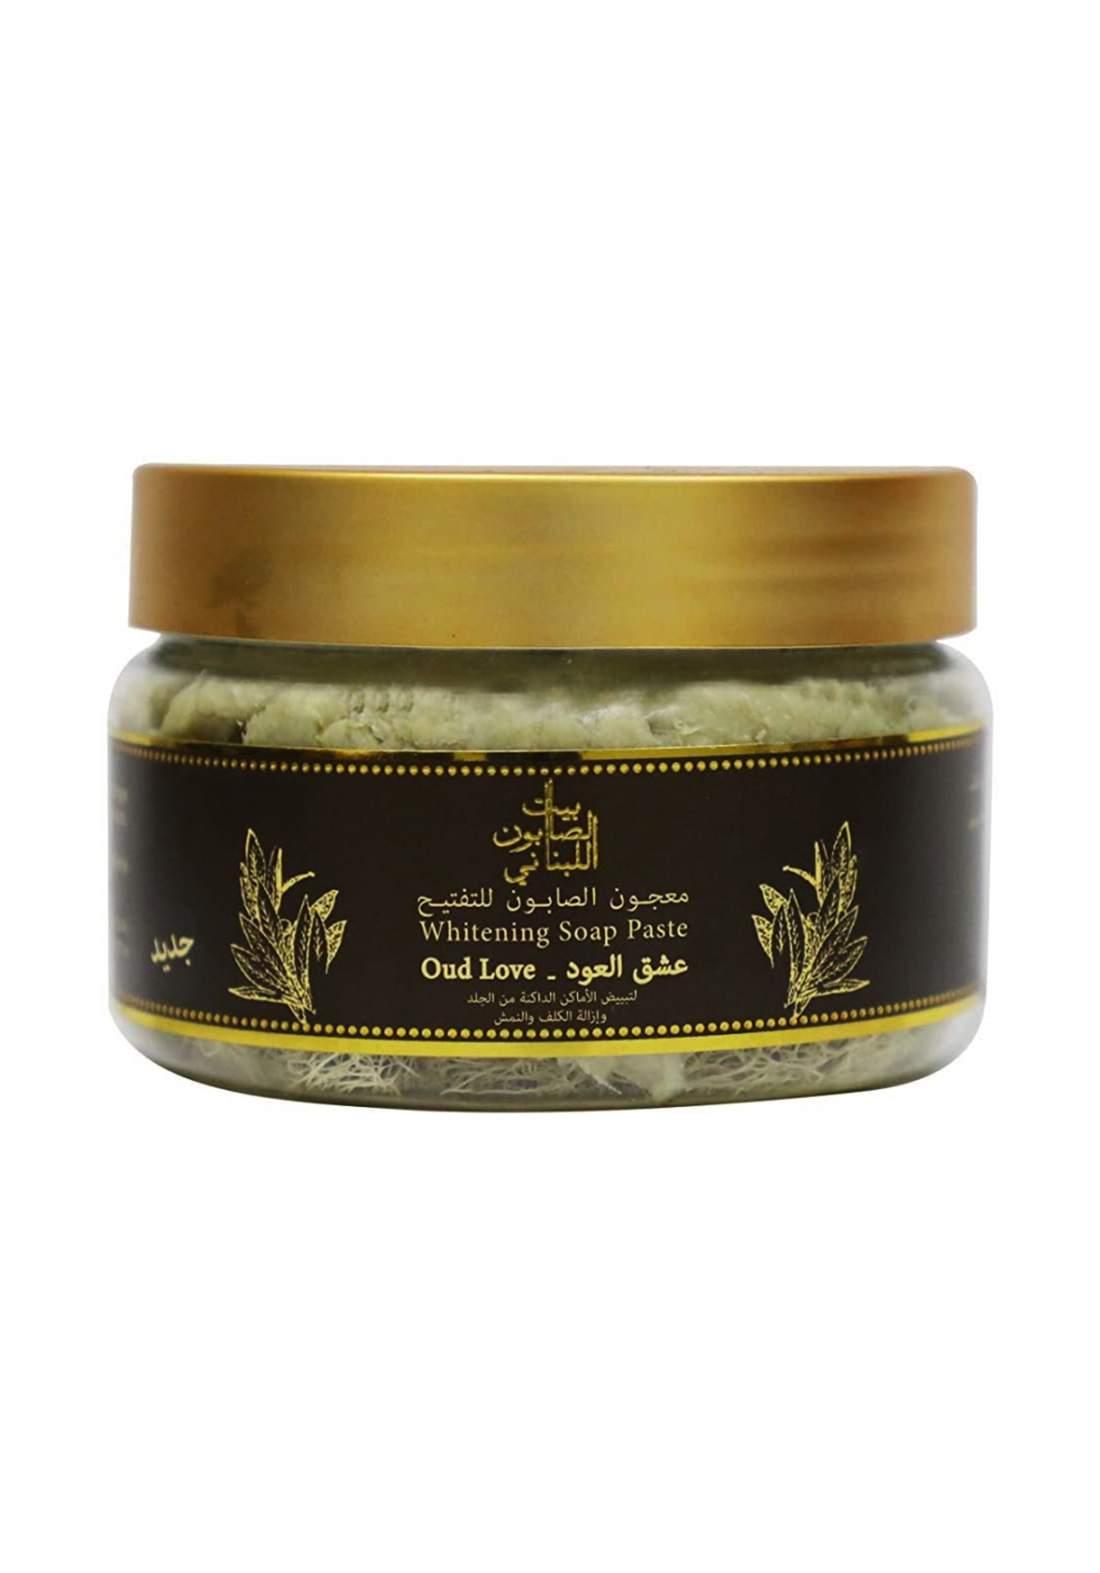 Bayt Alsaboun Alloubnani-317461 Whitining Soap Paste Oud Love 300g كريم